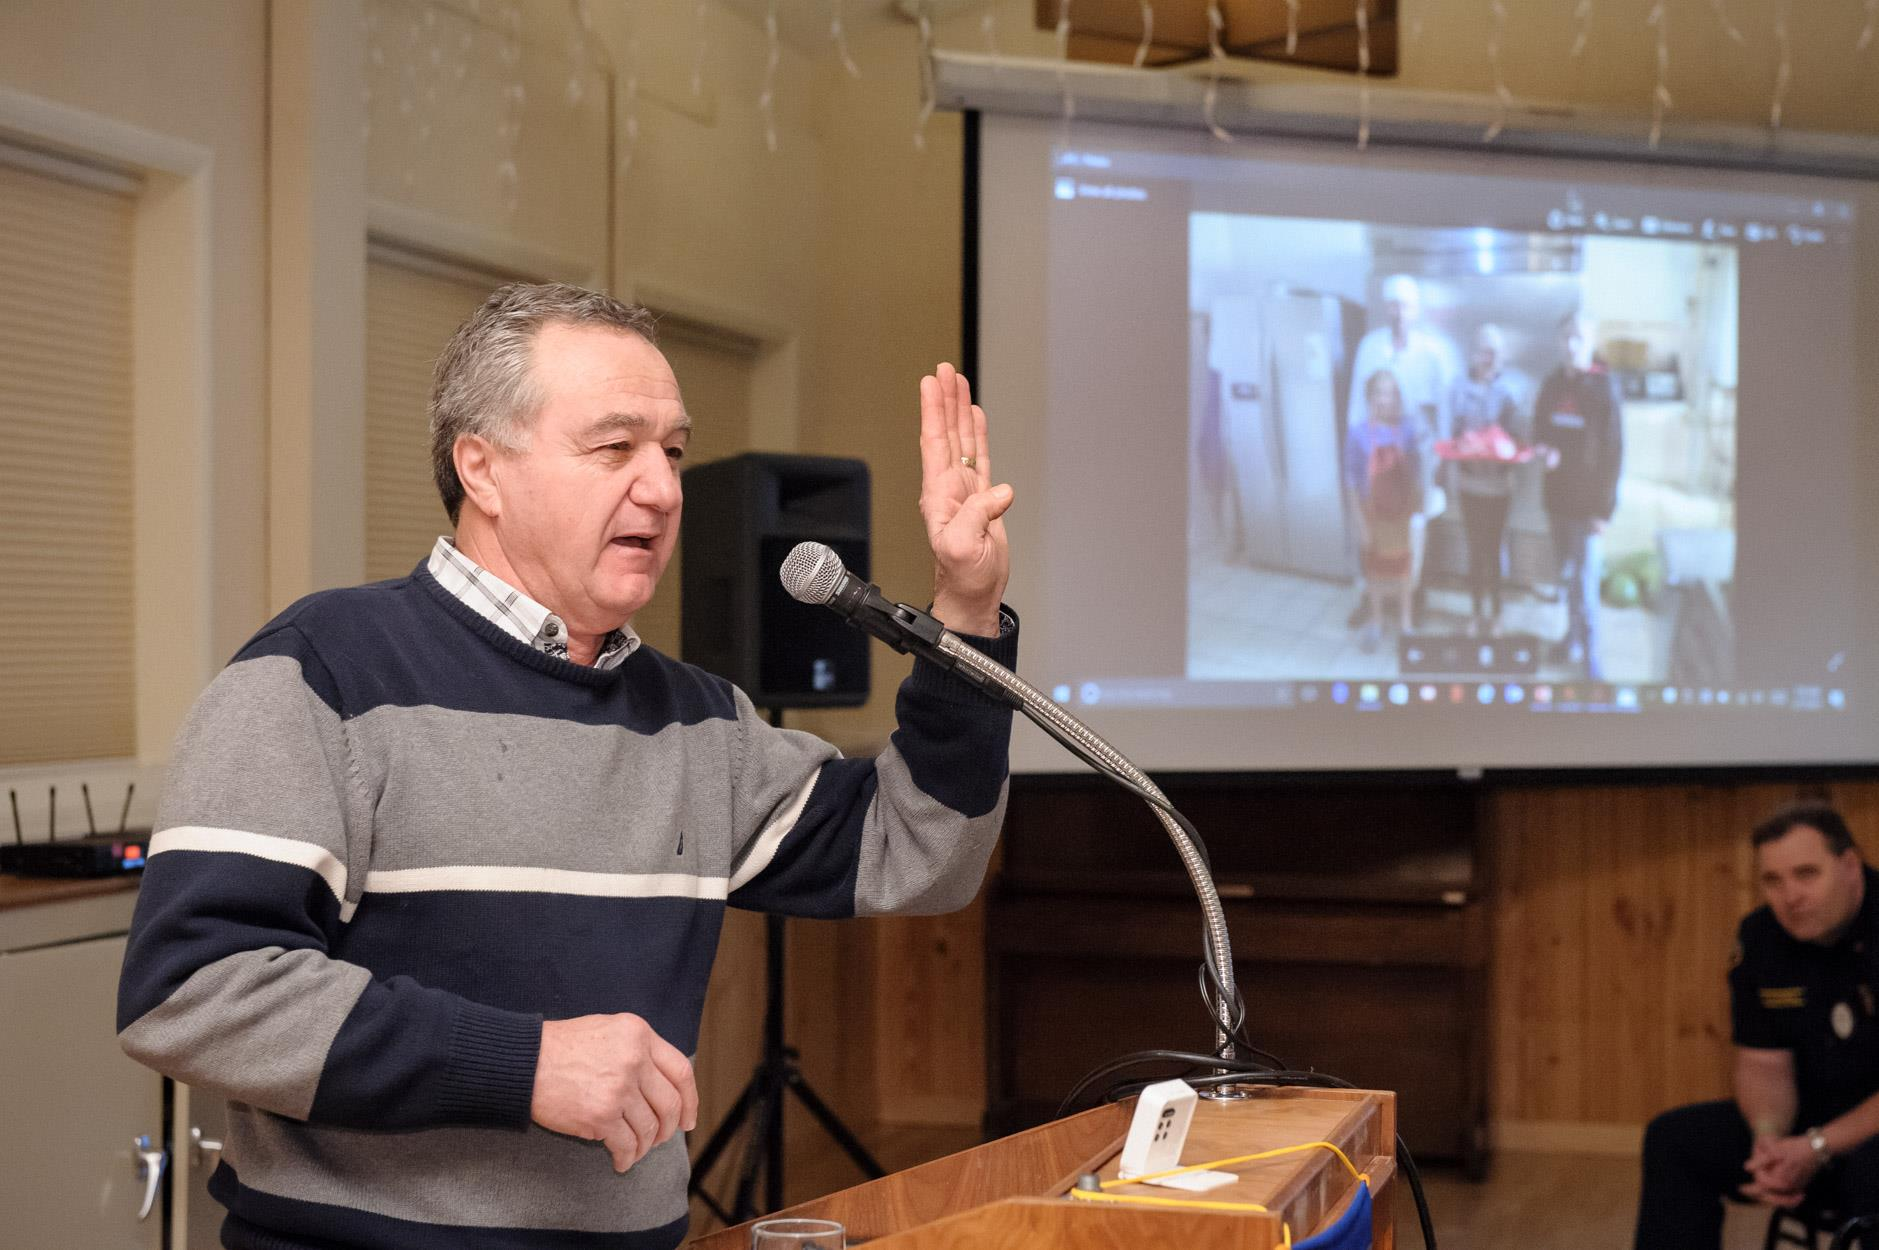 Behzad Mostofi